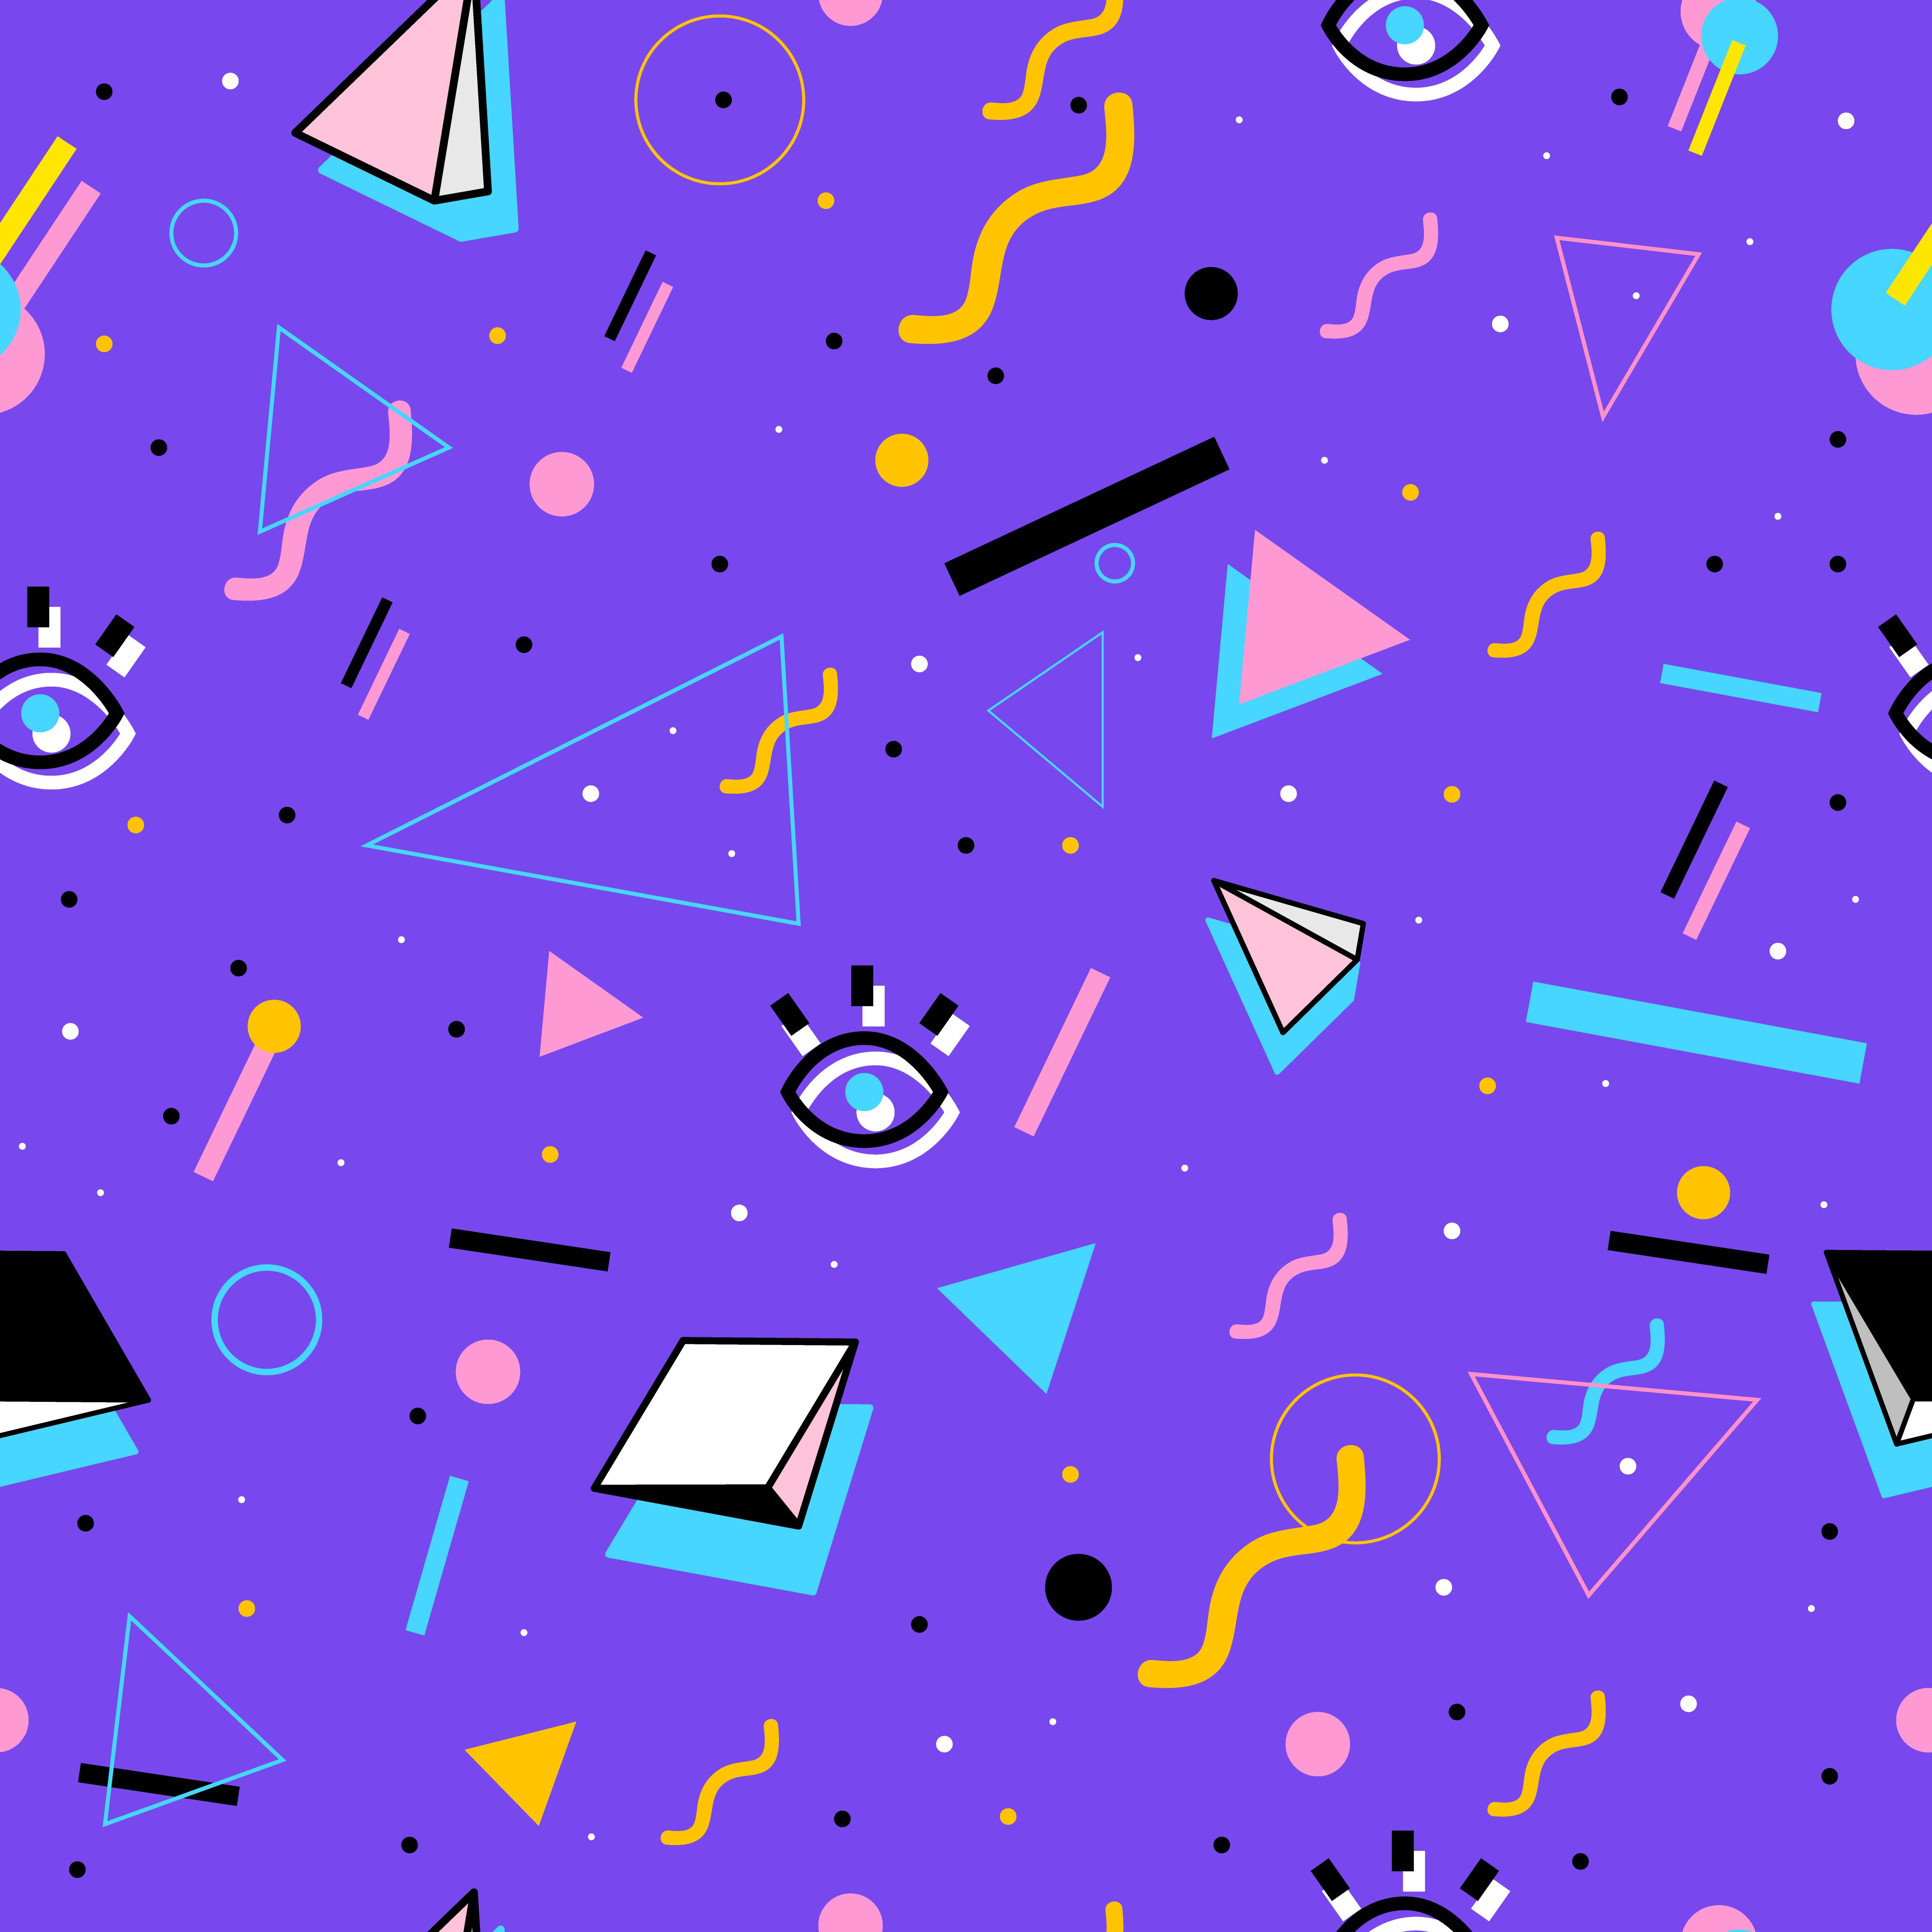 80's style pattern graphic design Pinterest 80 s